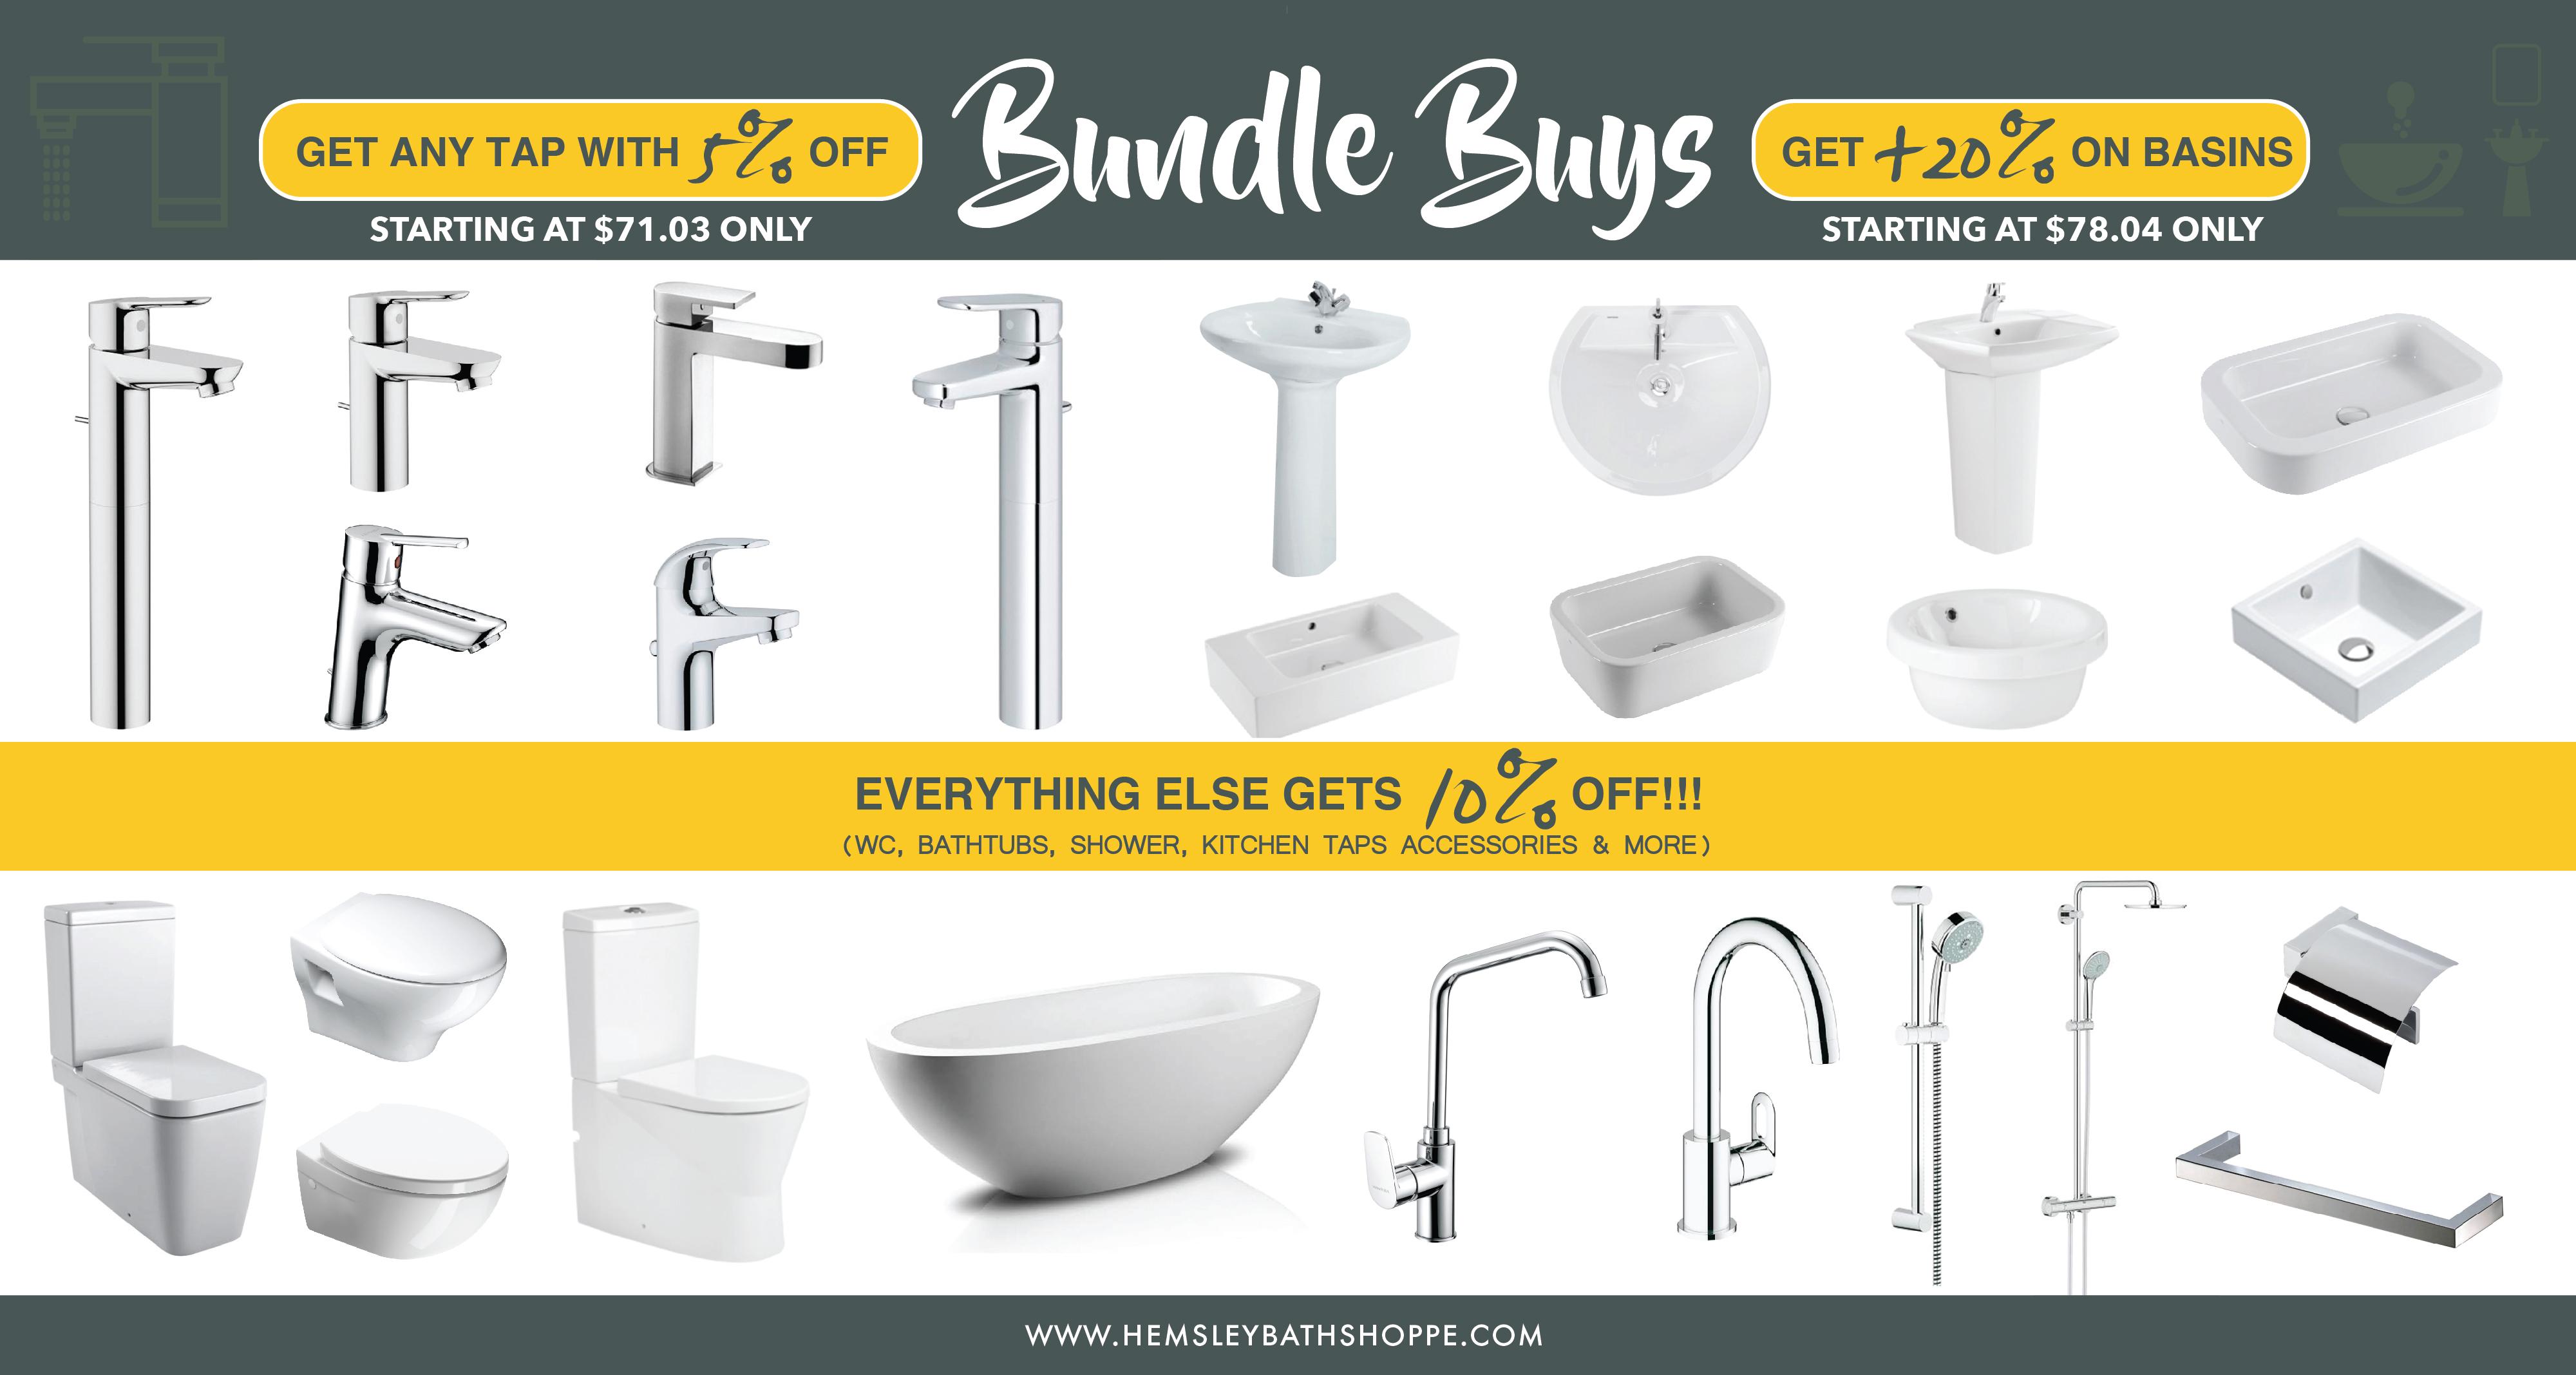 bundle-buys-facebook-cover-02